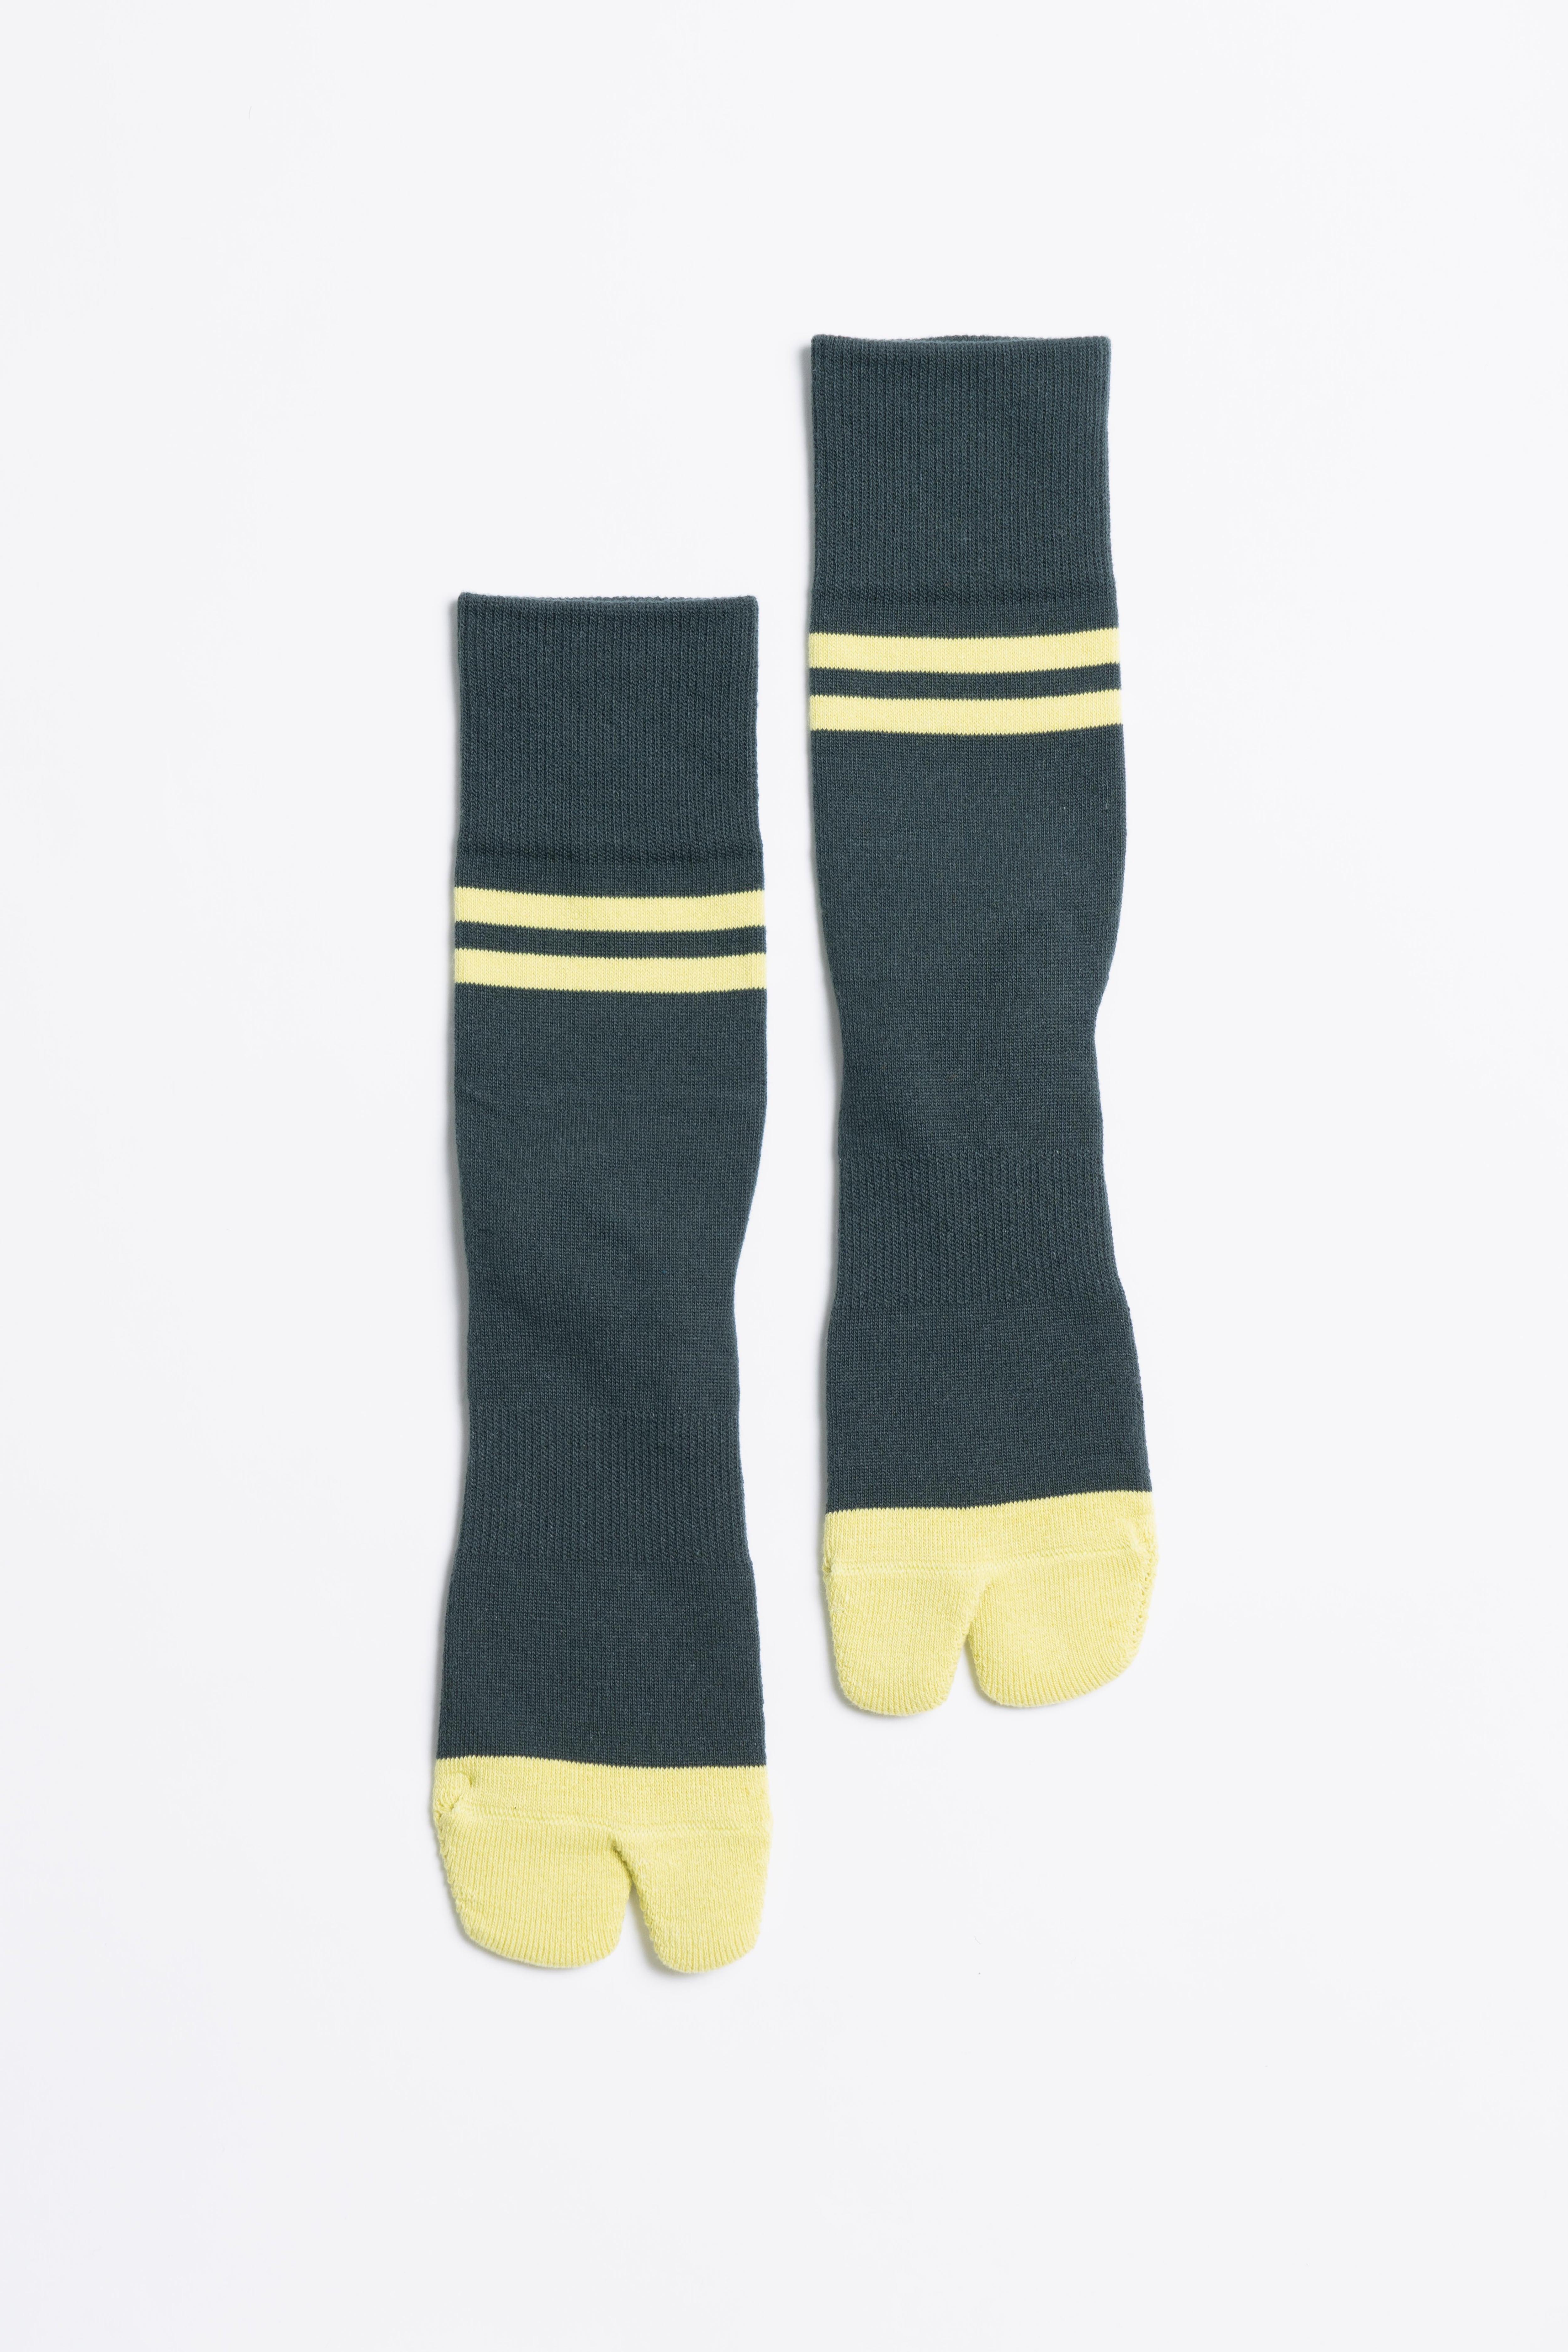 '90s Line Socks(Forest Green × Lime)